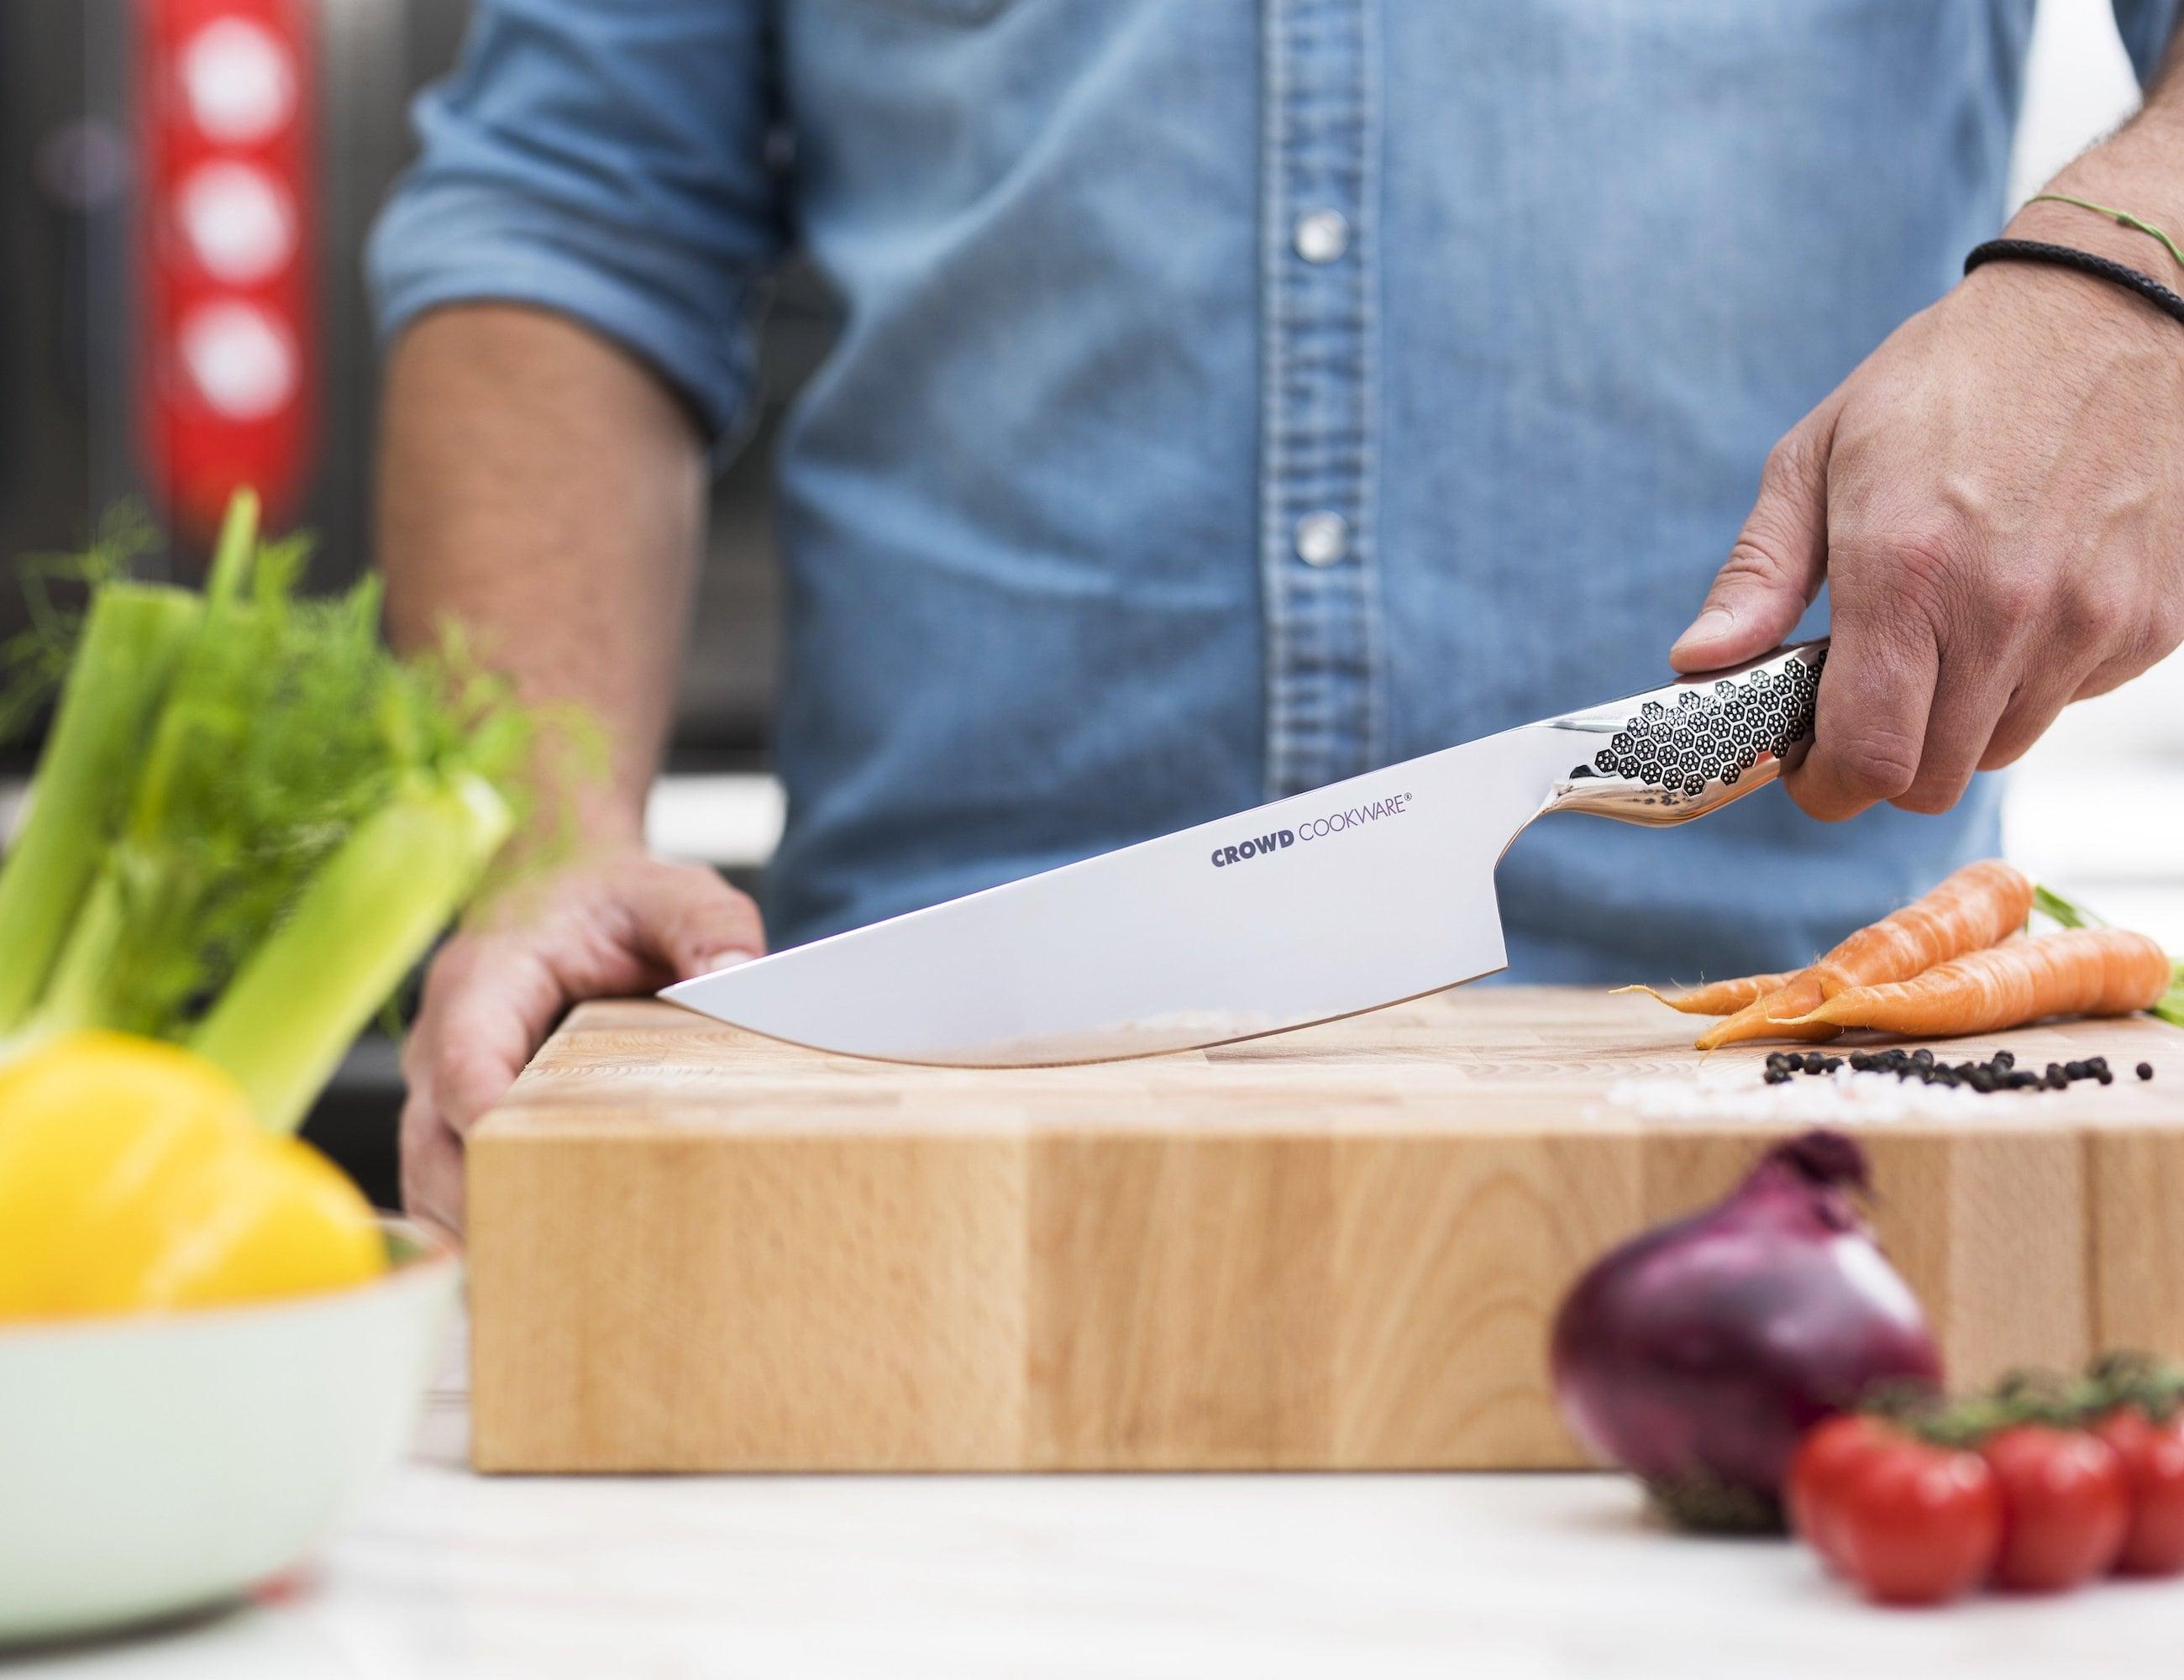 Wigbold Lifetime Sharp Chef's Knife